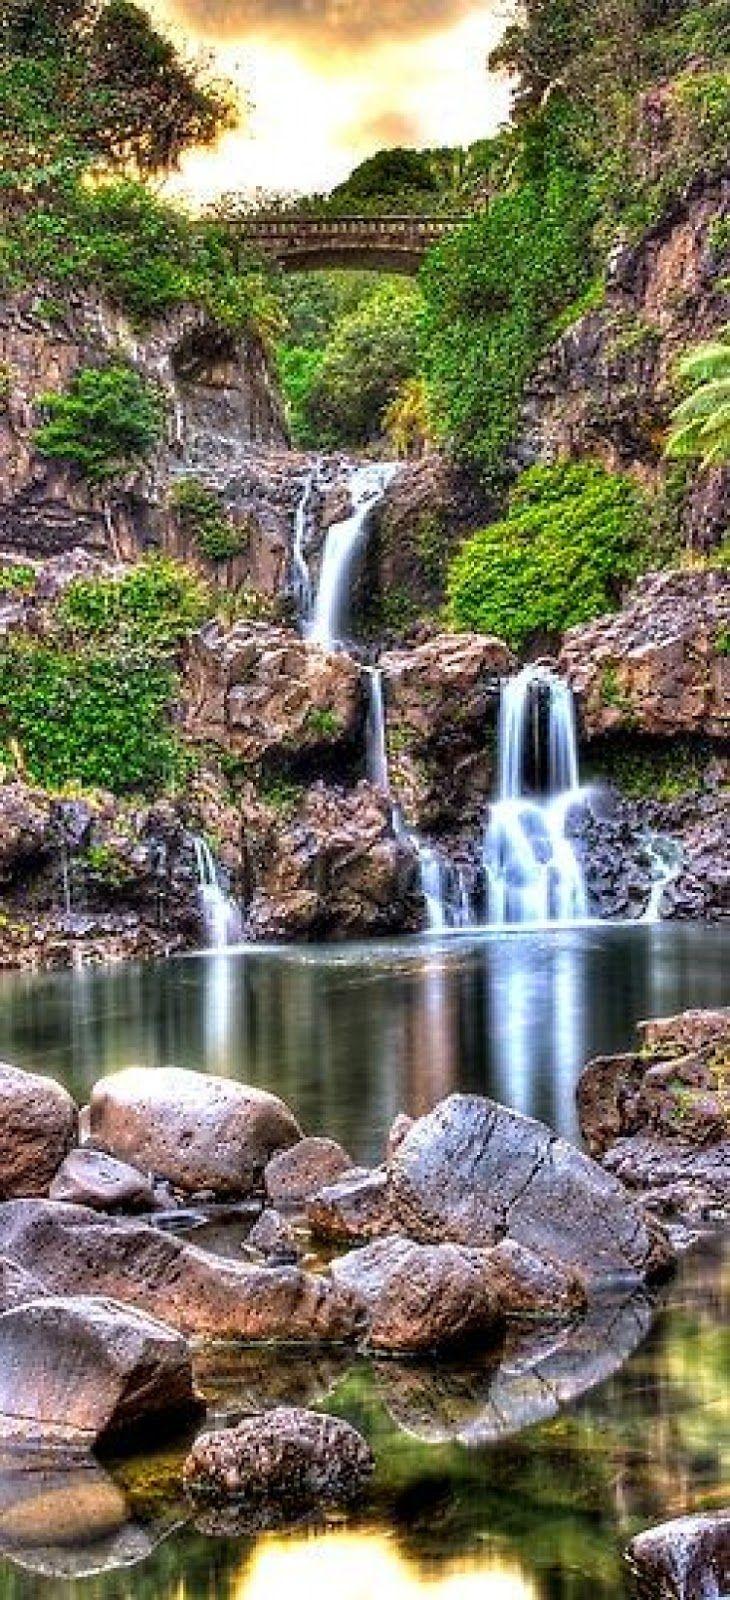 Preciosa Foto De Paisaje De Una Cascada Beautiful Landscape Picture Of A Waterfall Lugares Hermosos Hermosos Paisajes Paisajes